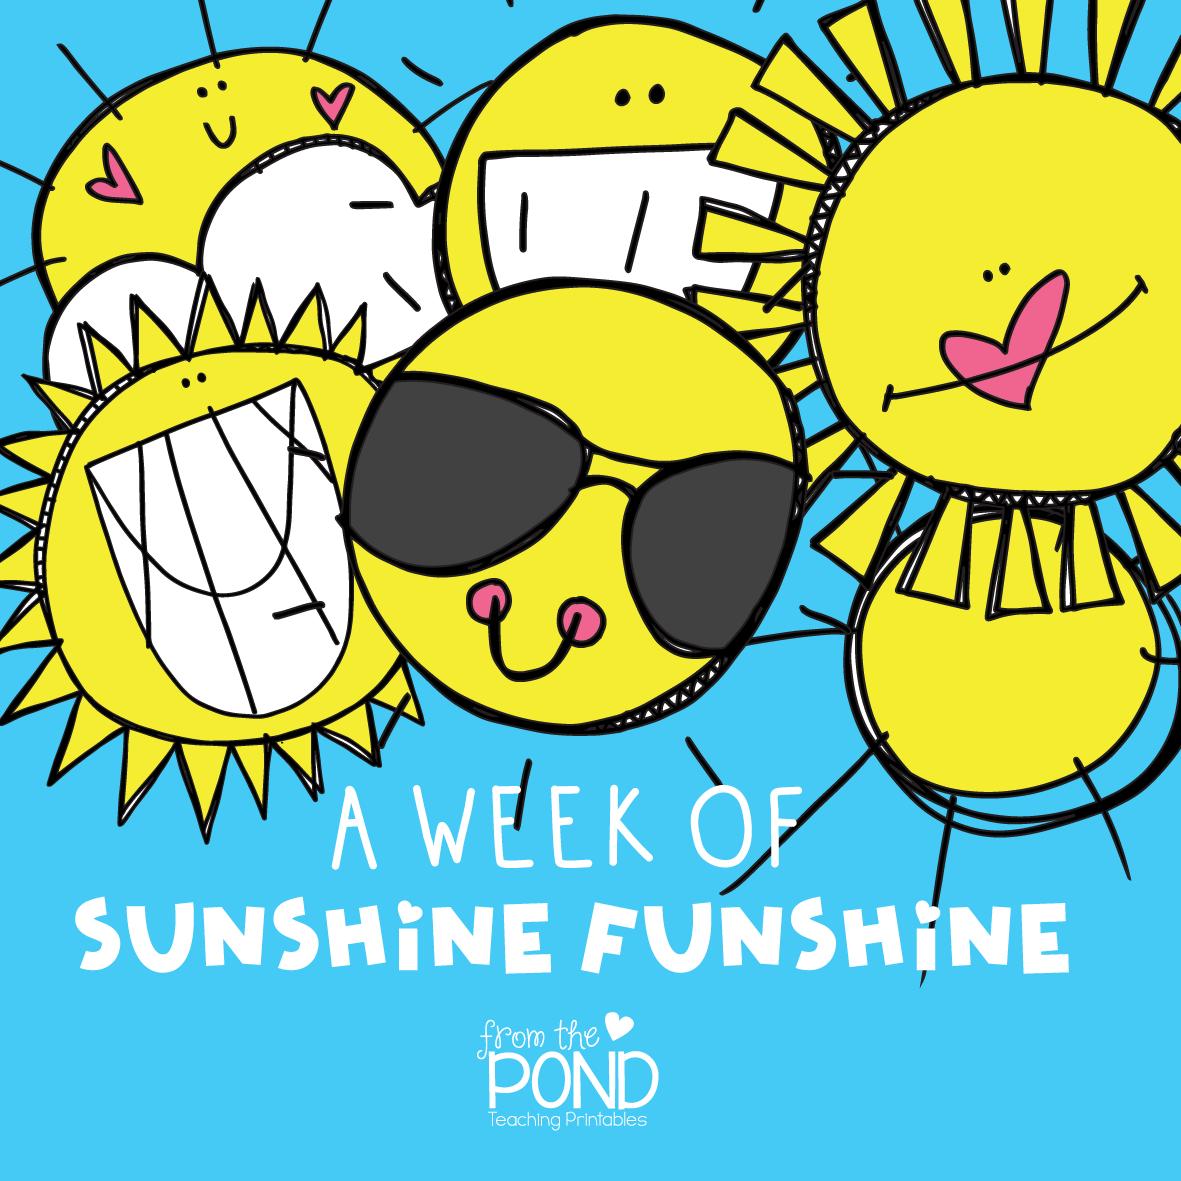 Sunshine Funshine Week | From the Pond